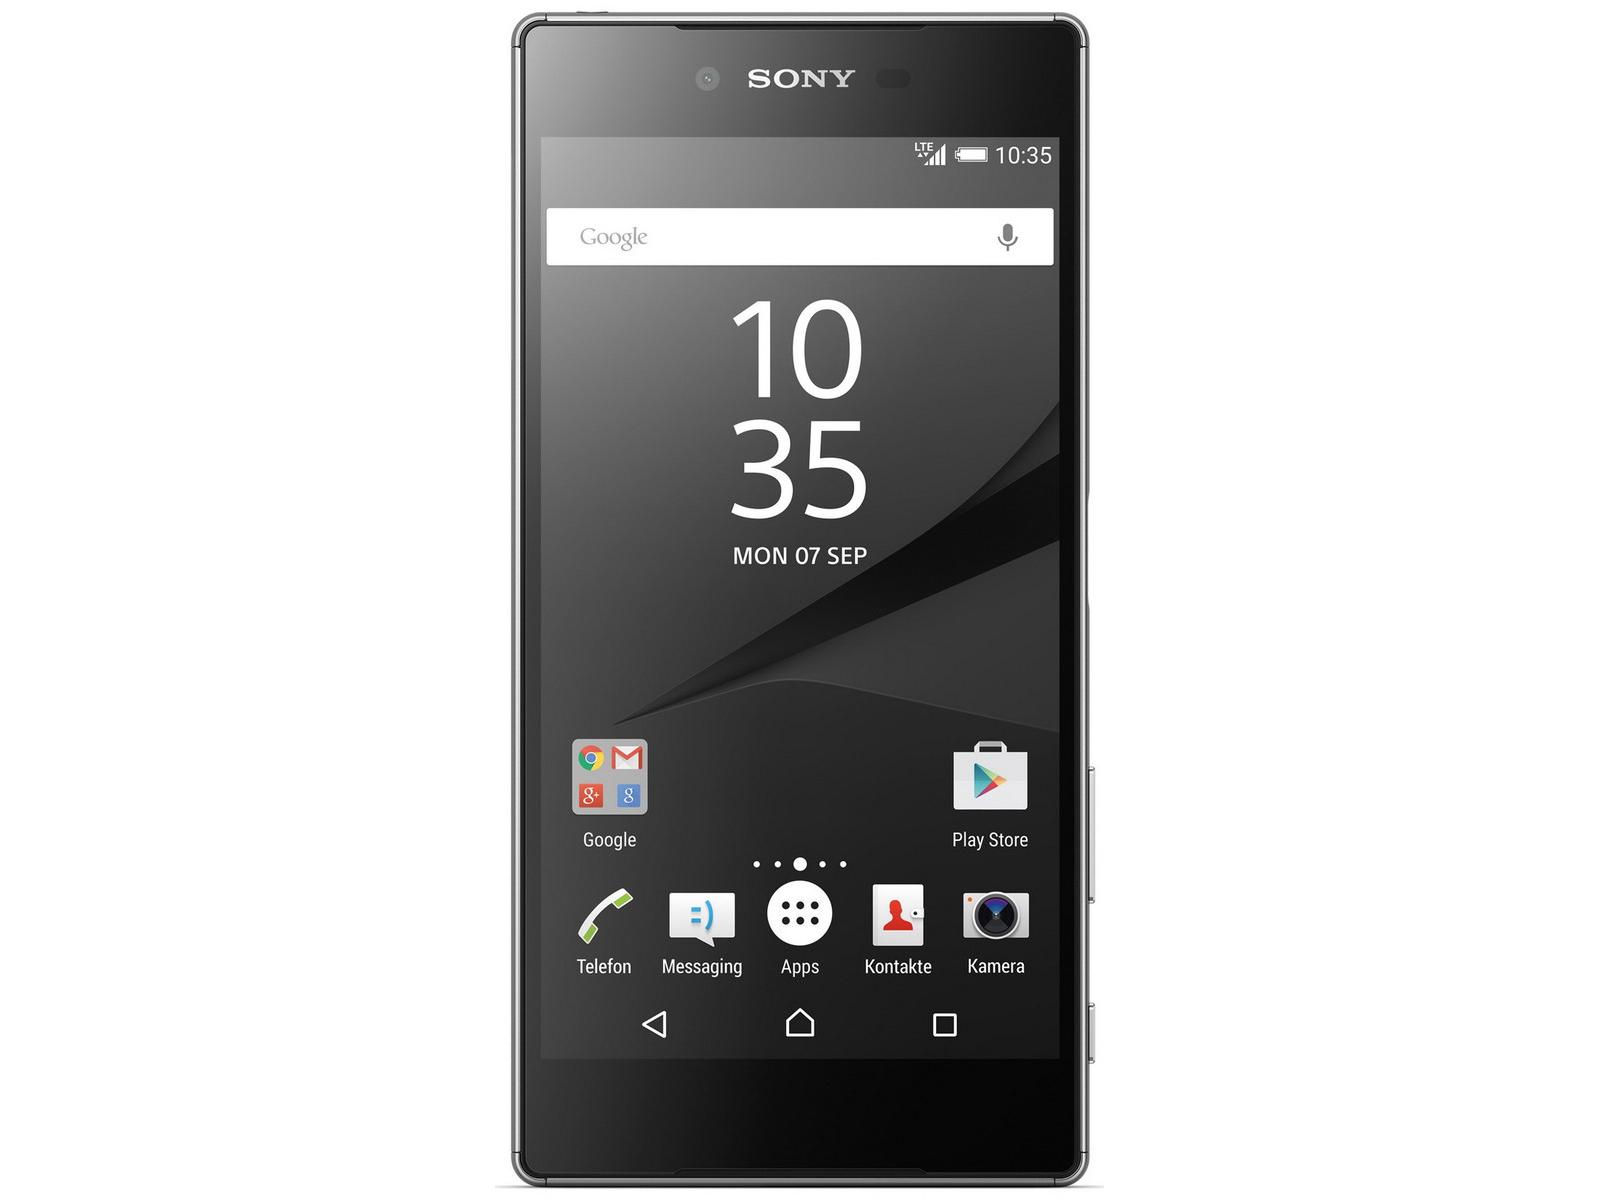 4e8d26865ff Sony Xperia Z5 Premium - Notebookcheck.net External Reviews